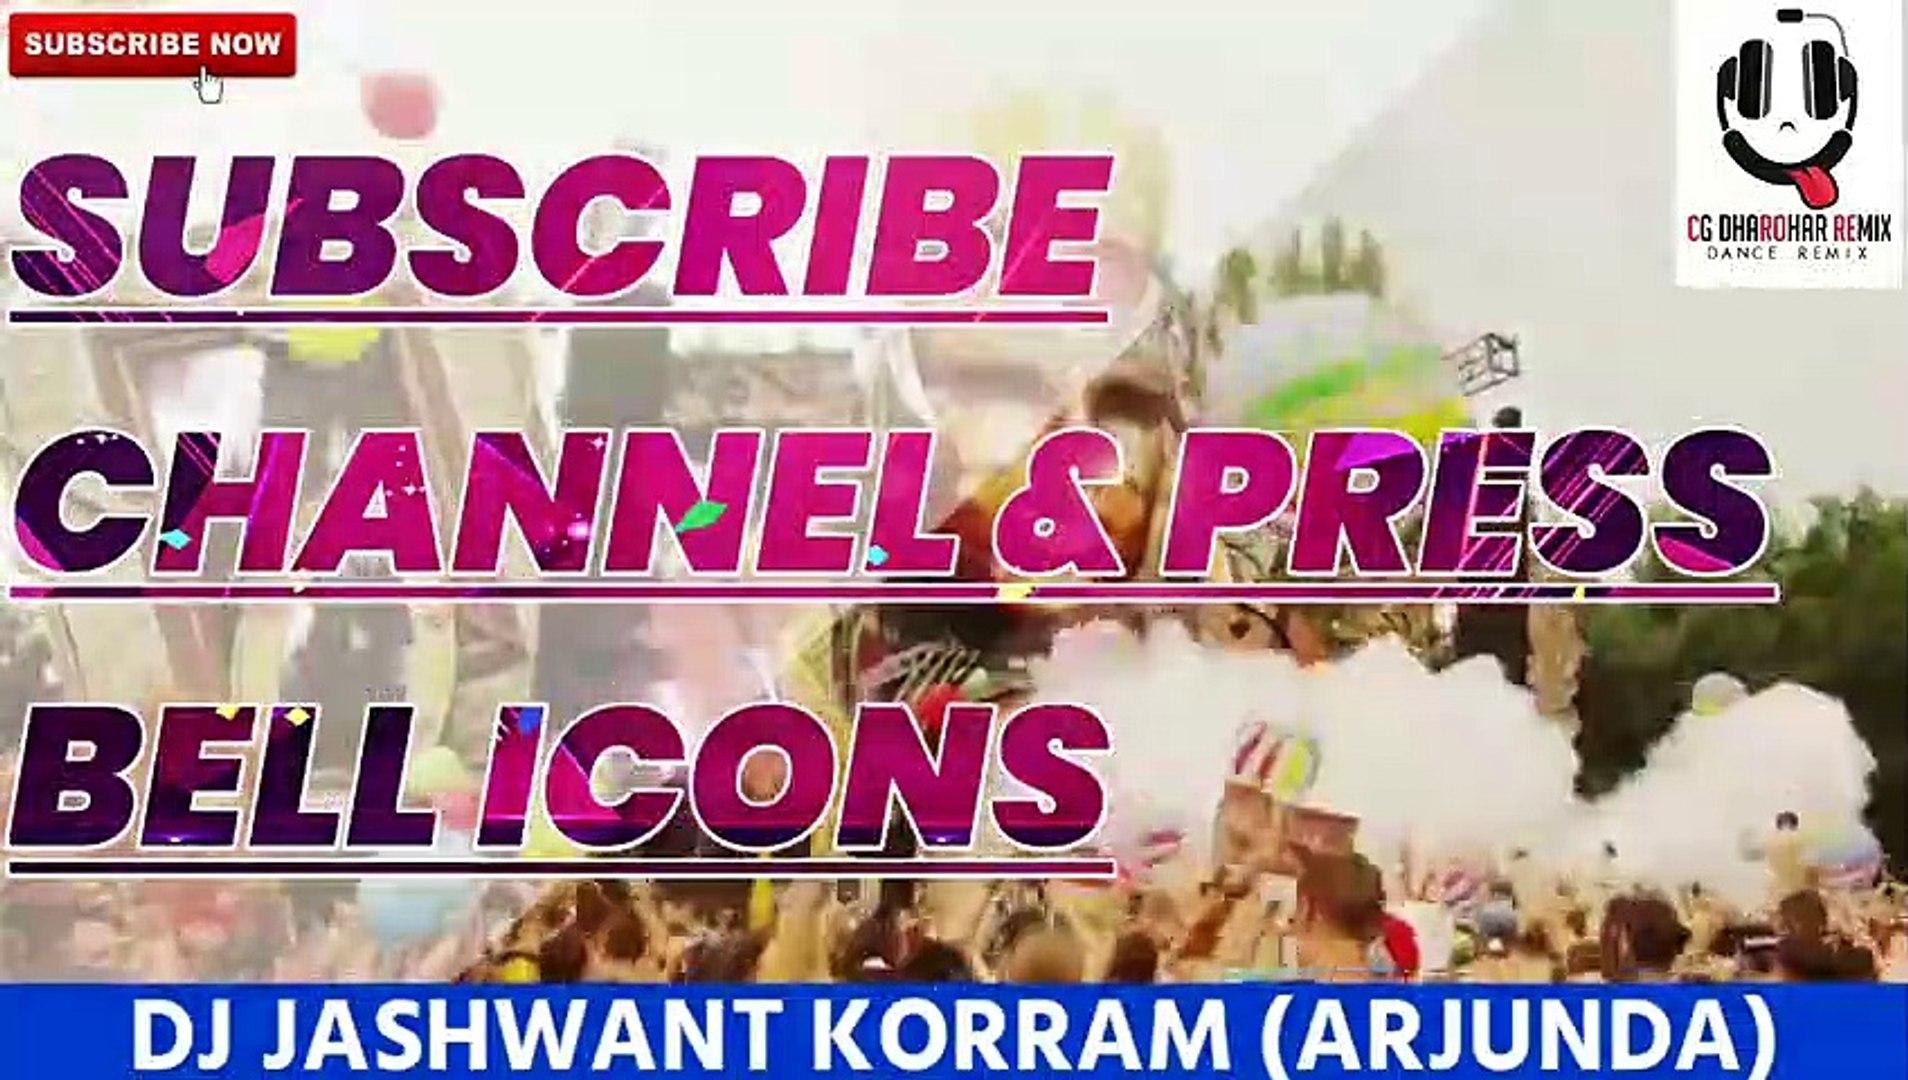 Barati Dance ¦Cg Bihav dj song ¦ bhihav paar 2019 new Dance song ¦ dj  jashwant korram Arjunda